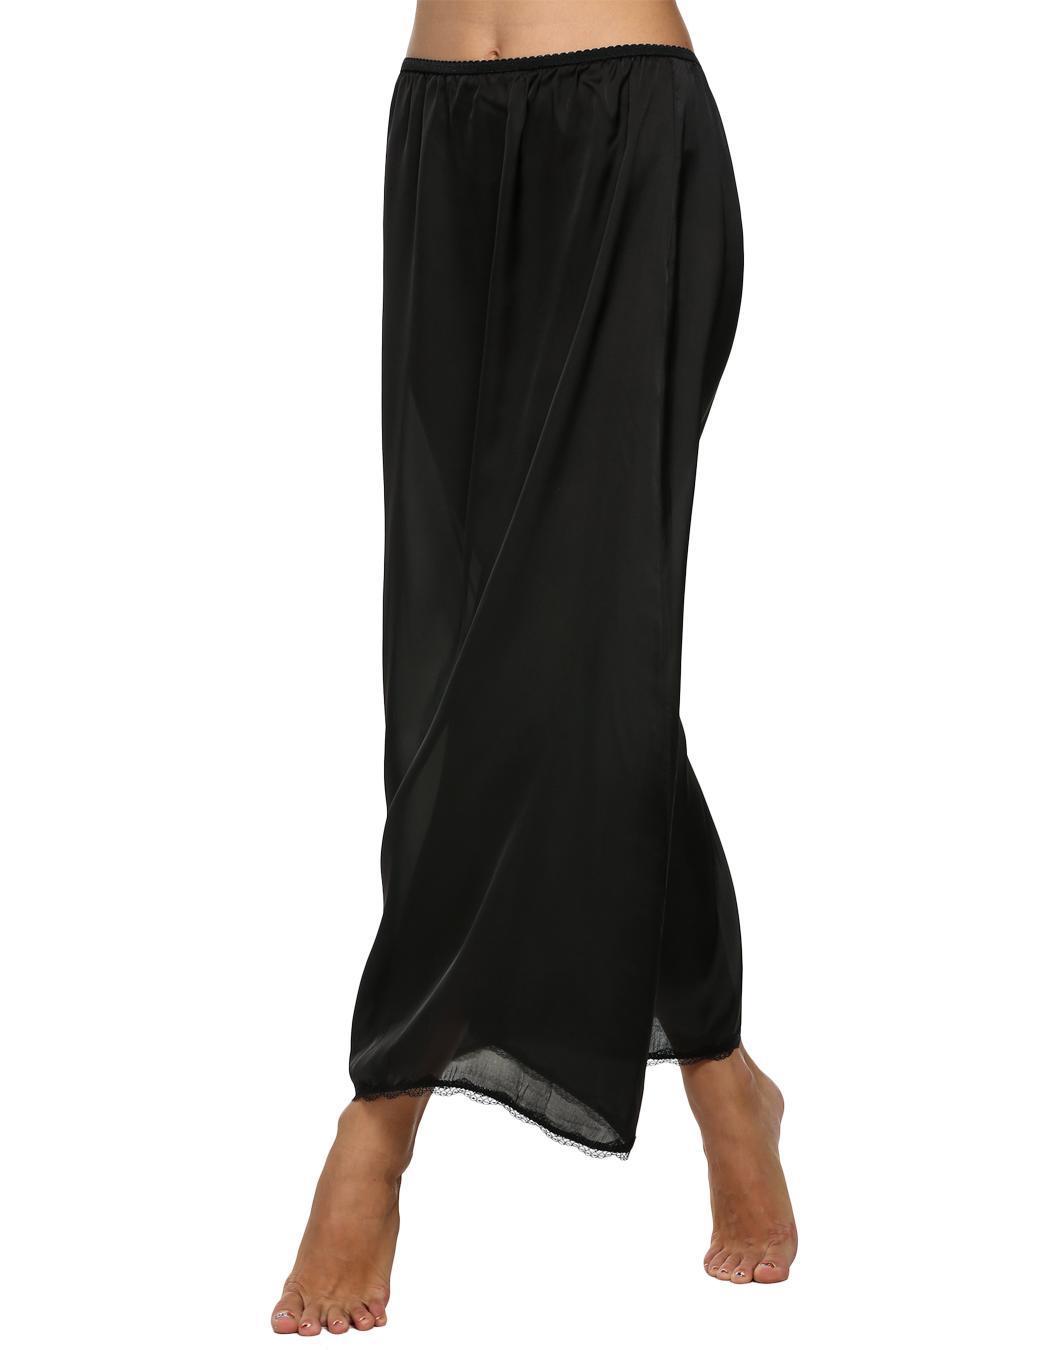 Women Satin Solid Lace Trim Maxi Half Slip Underskirt Slip Skirt 3